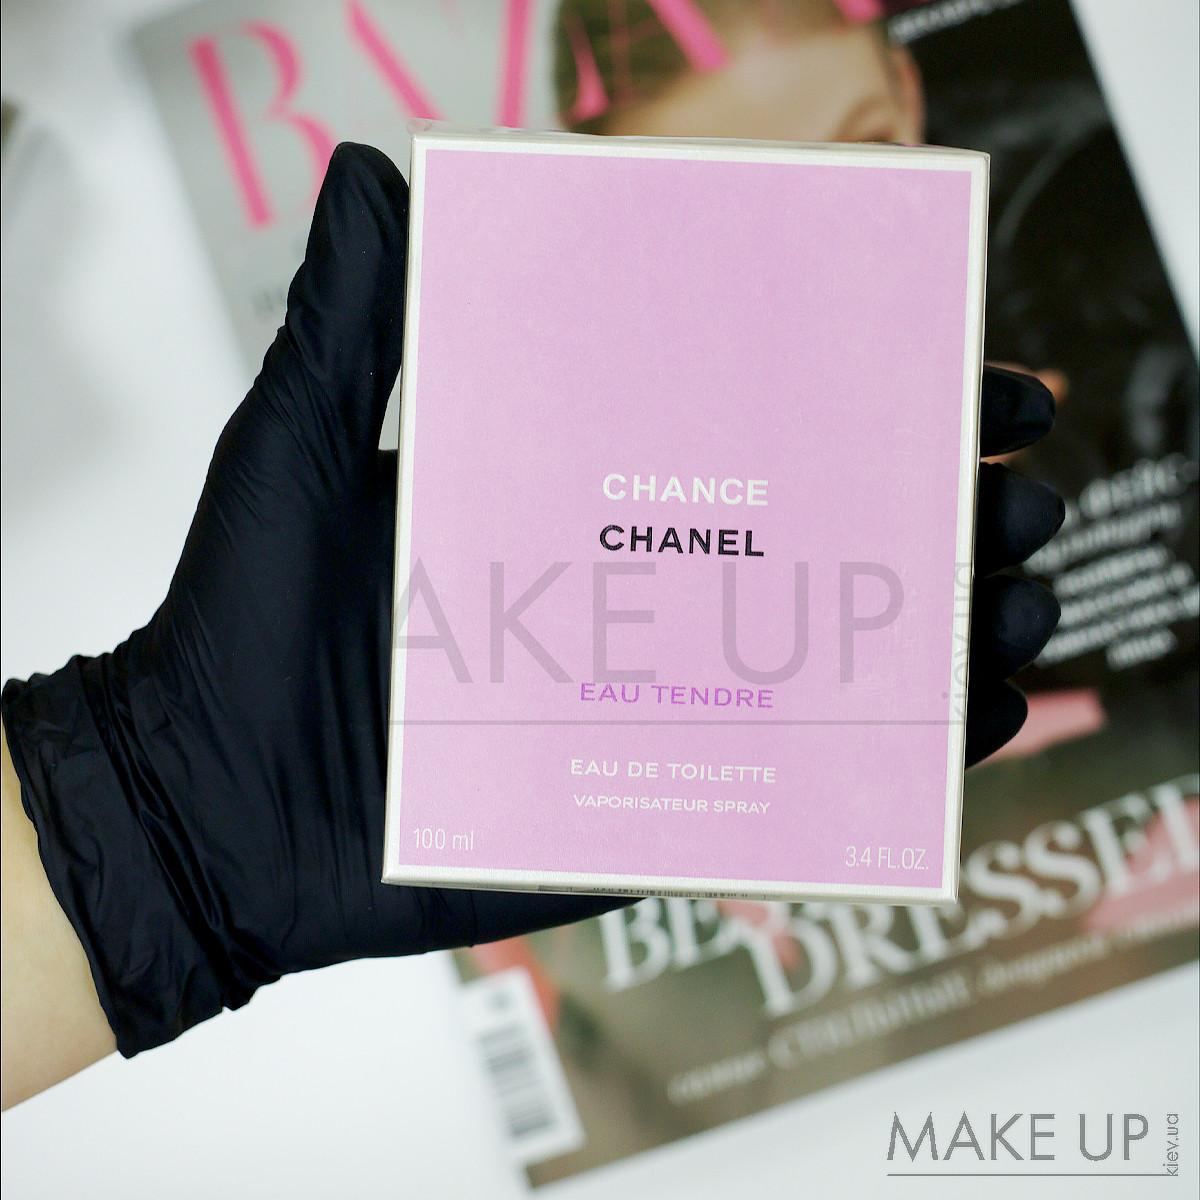 Женская туалетная вода Chanel Chance Eau Tendre EDT 100 мл. | Лицензия Объединённые  Арабские Эмираты